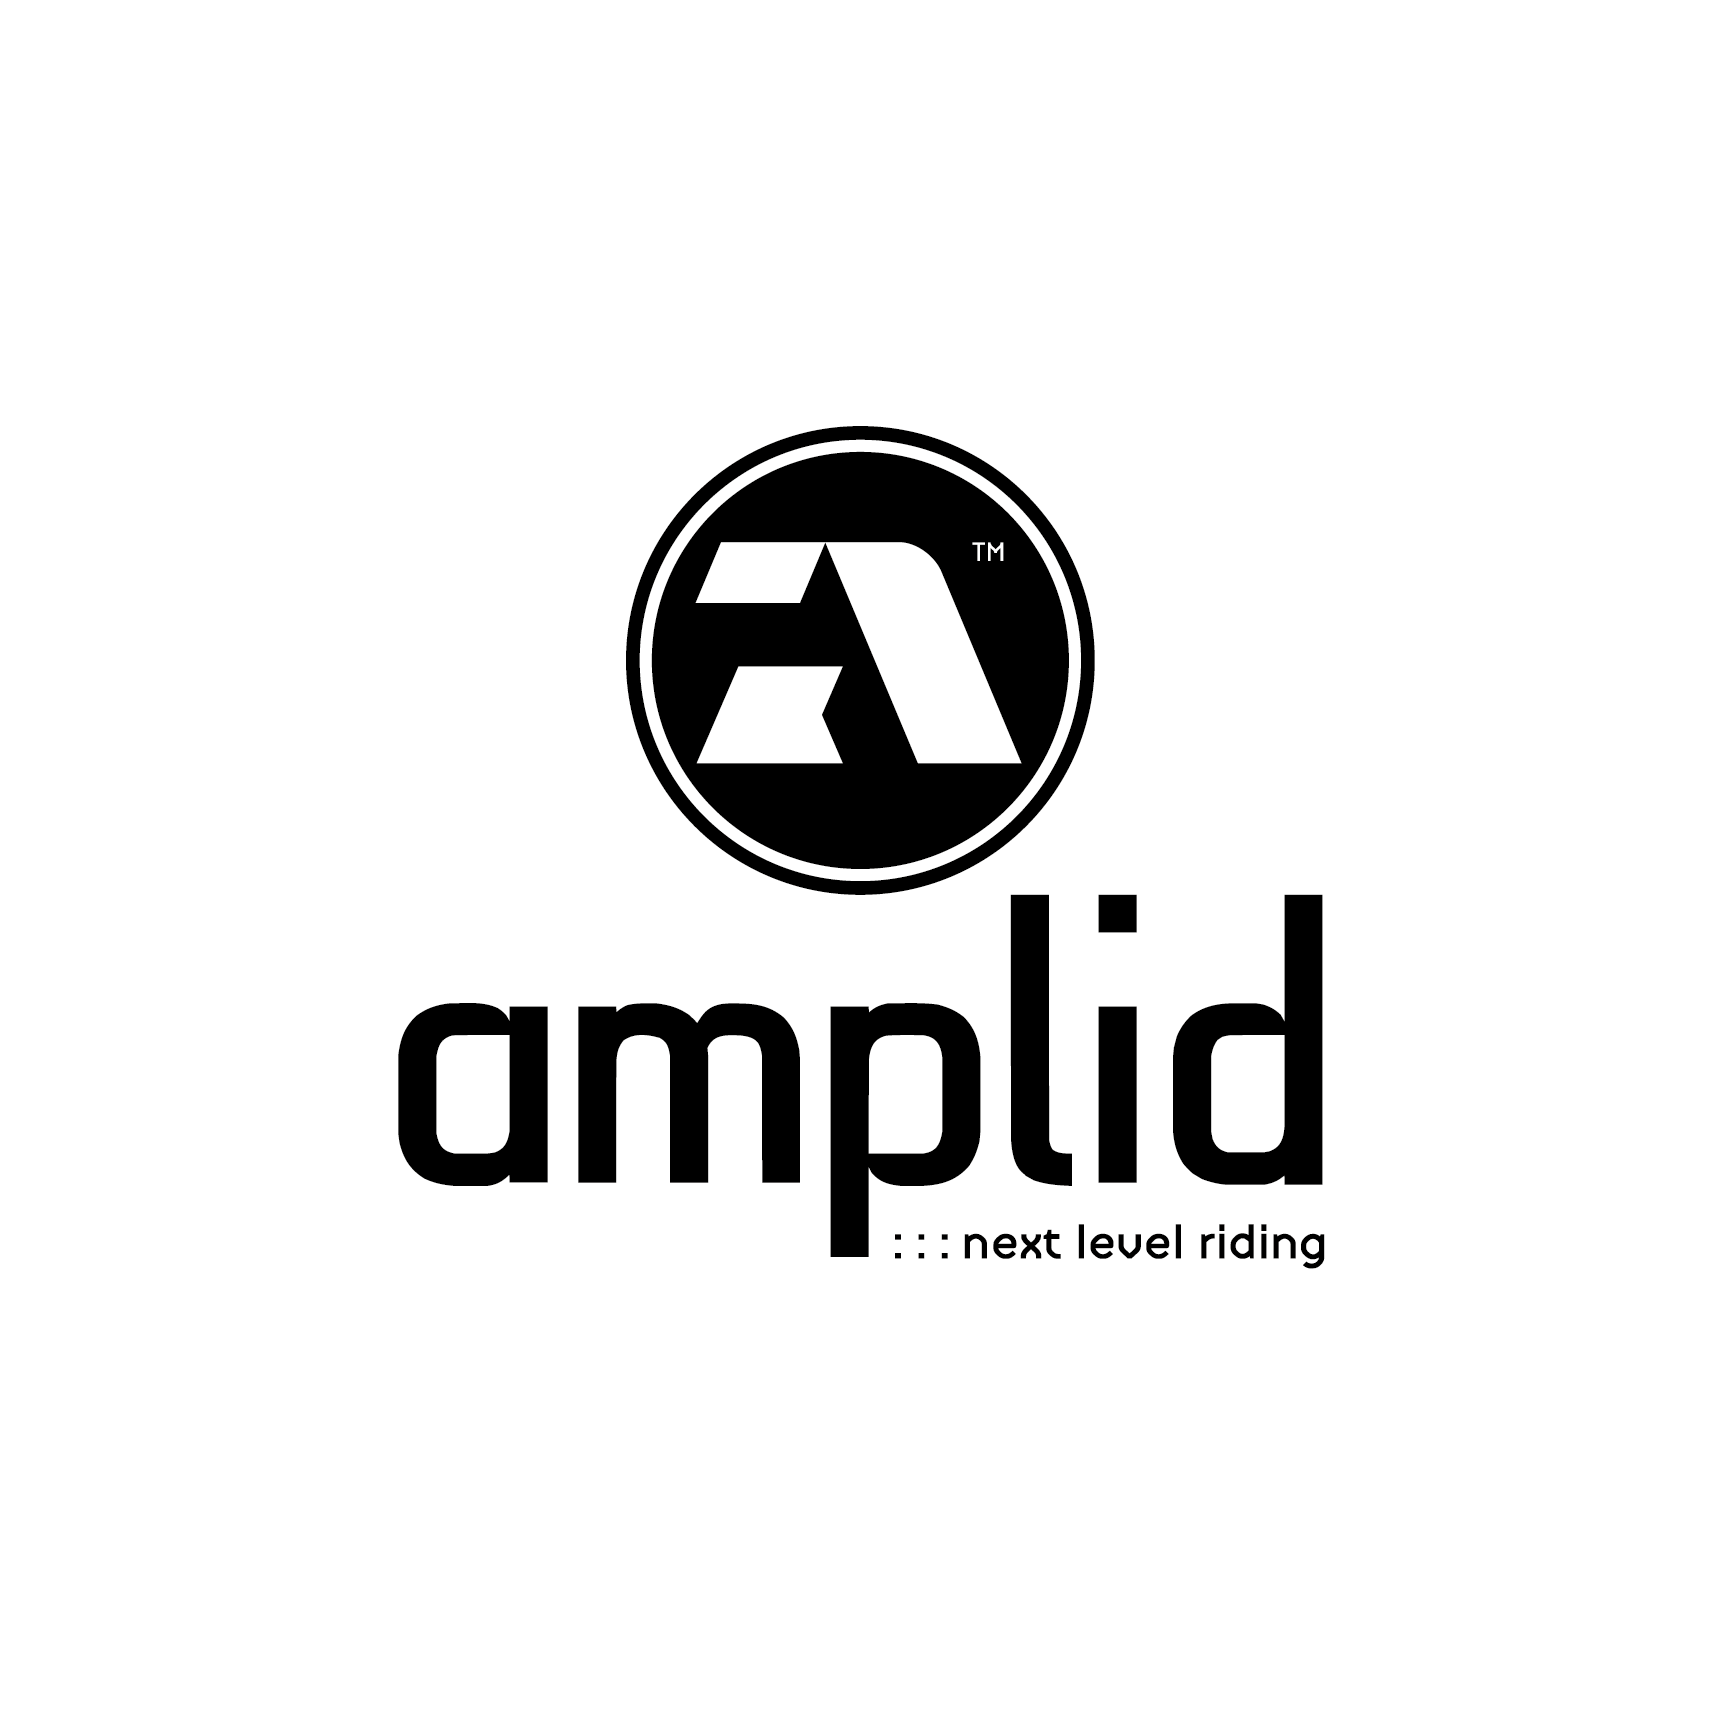 amplid logo